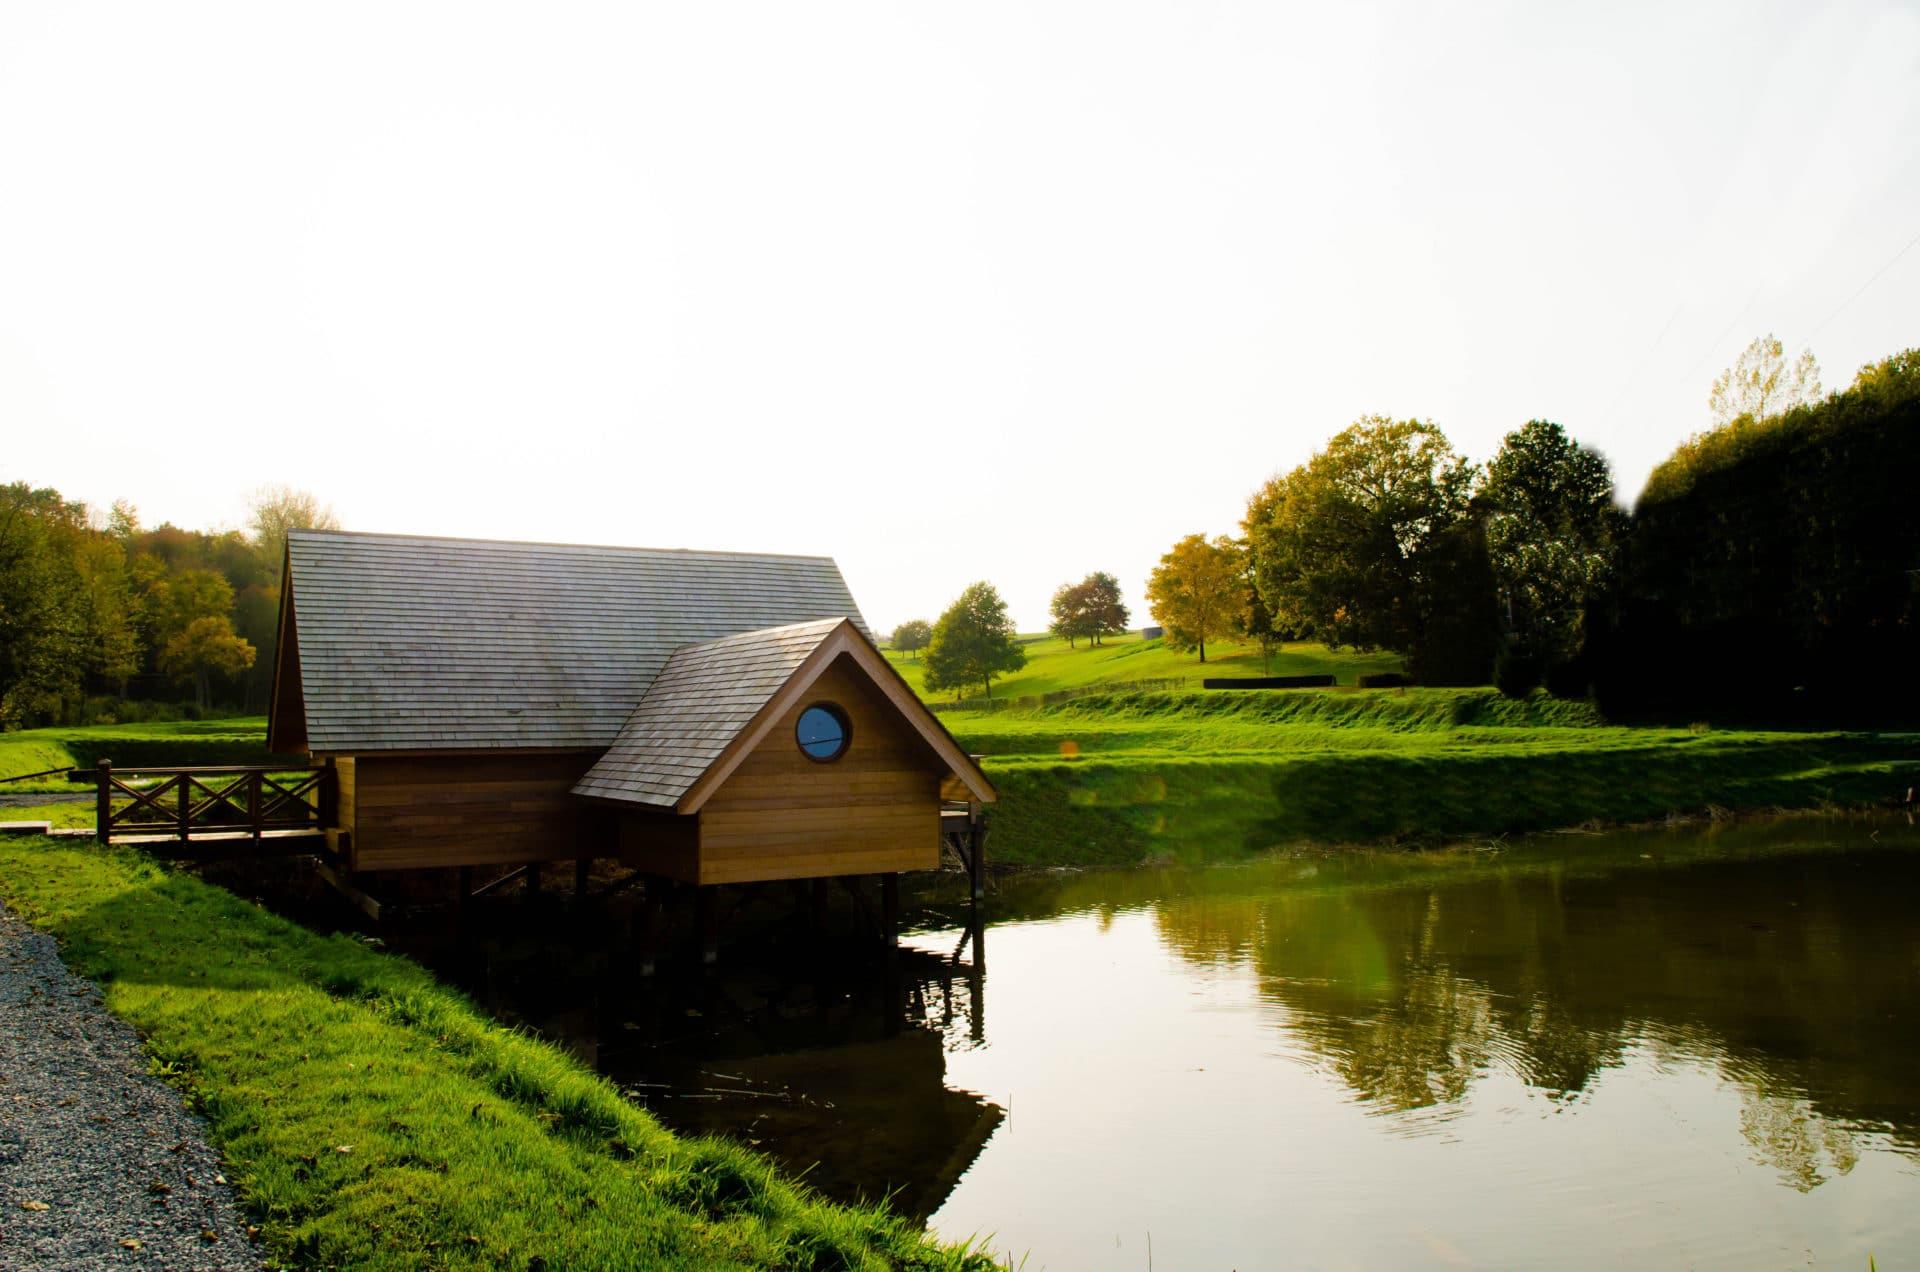 Aqualodge - Lodges insolites | La Balade du Cygne